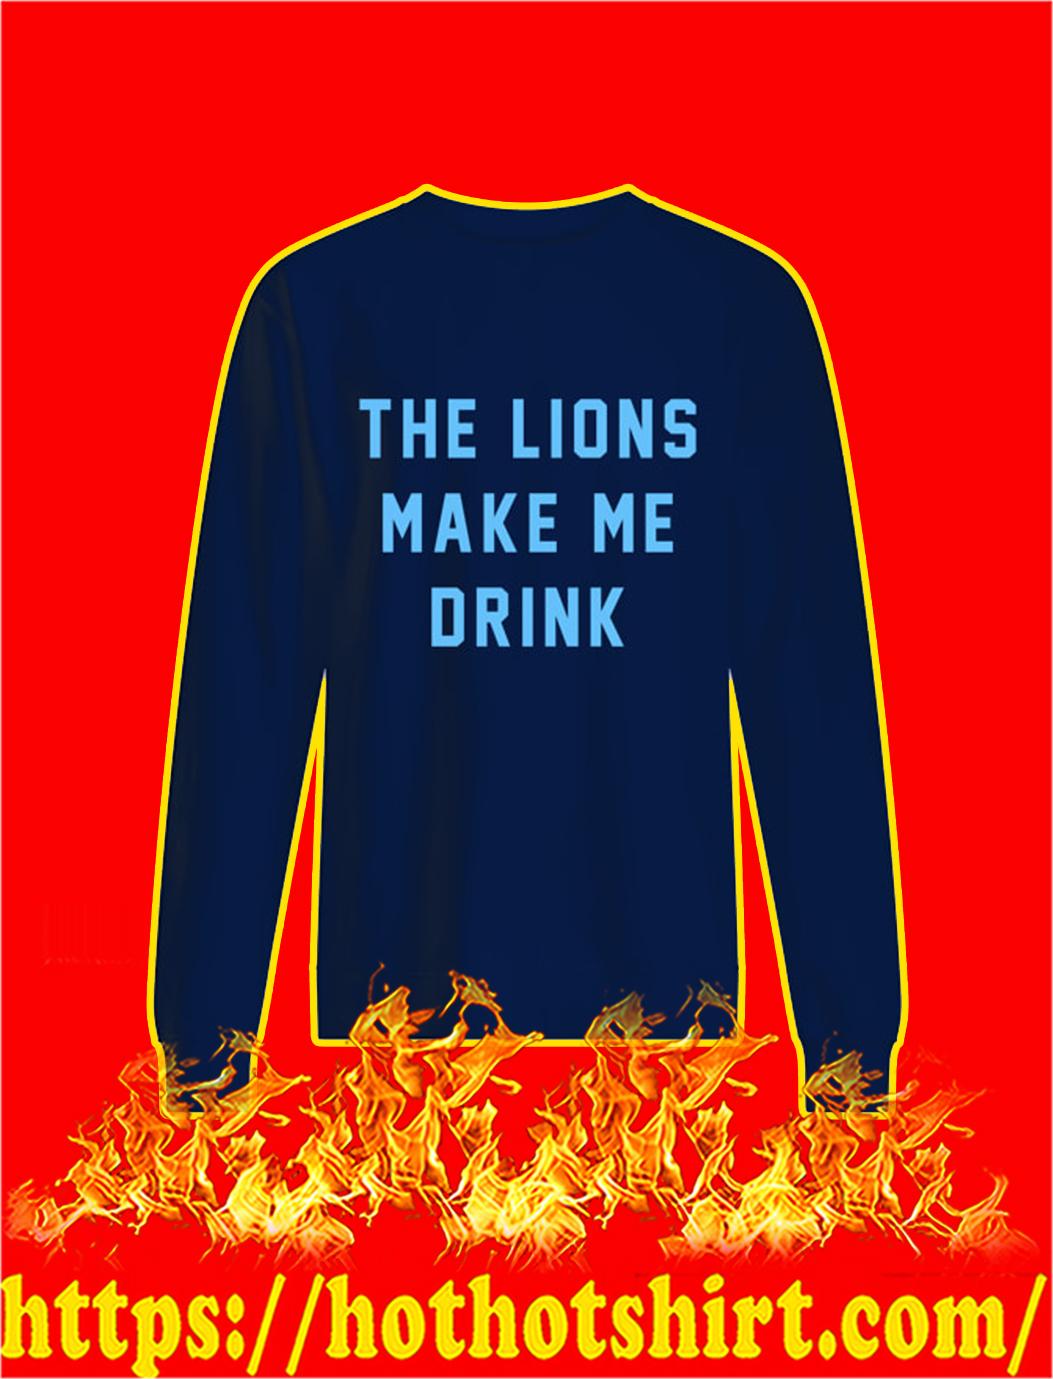 The Lions Make Me Drink sweatshirt